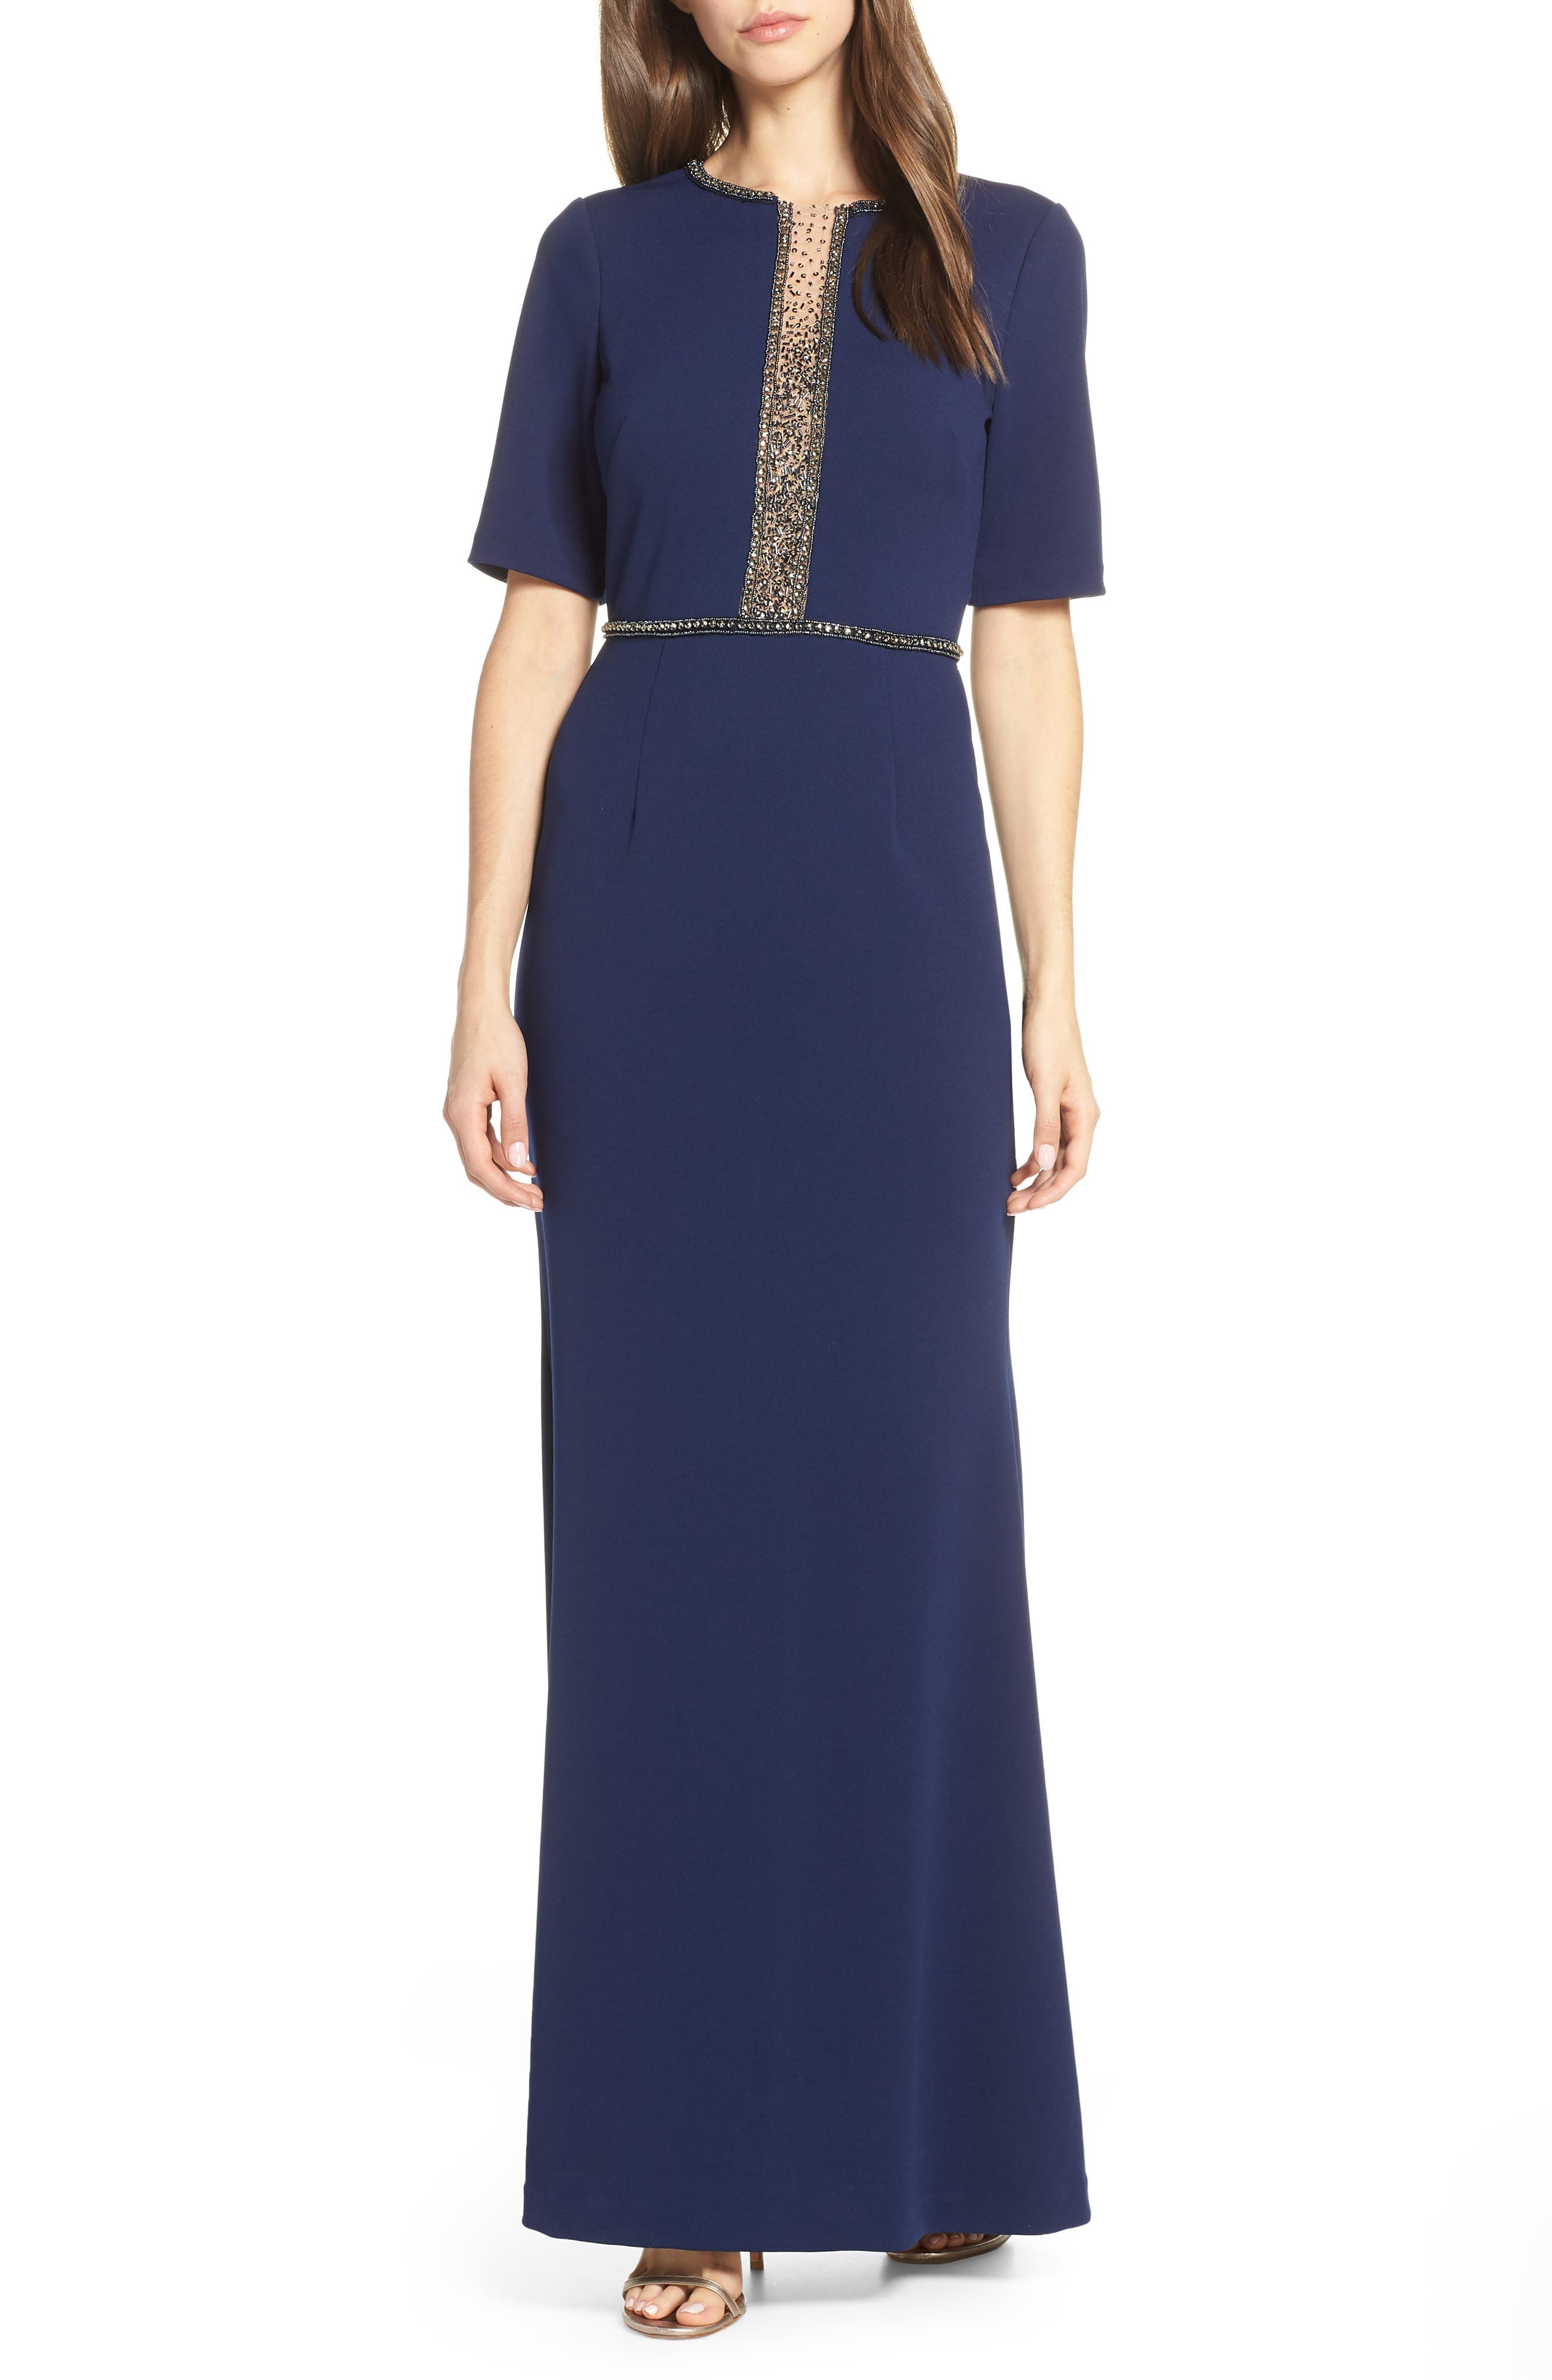 Adrianna Papell Beaded Crepe Evening Dress, Blue